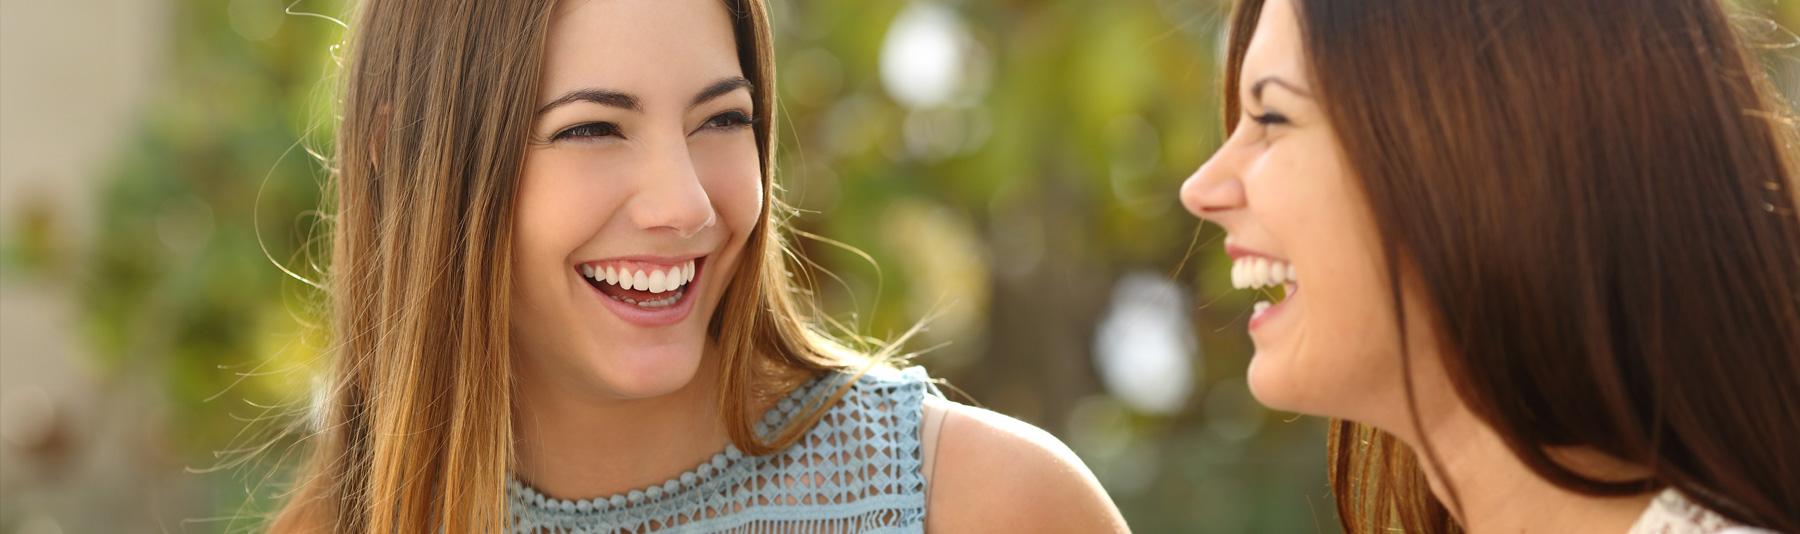 Dentist in Meridian, ID | Legacy Smiles Family Dental